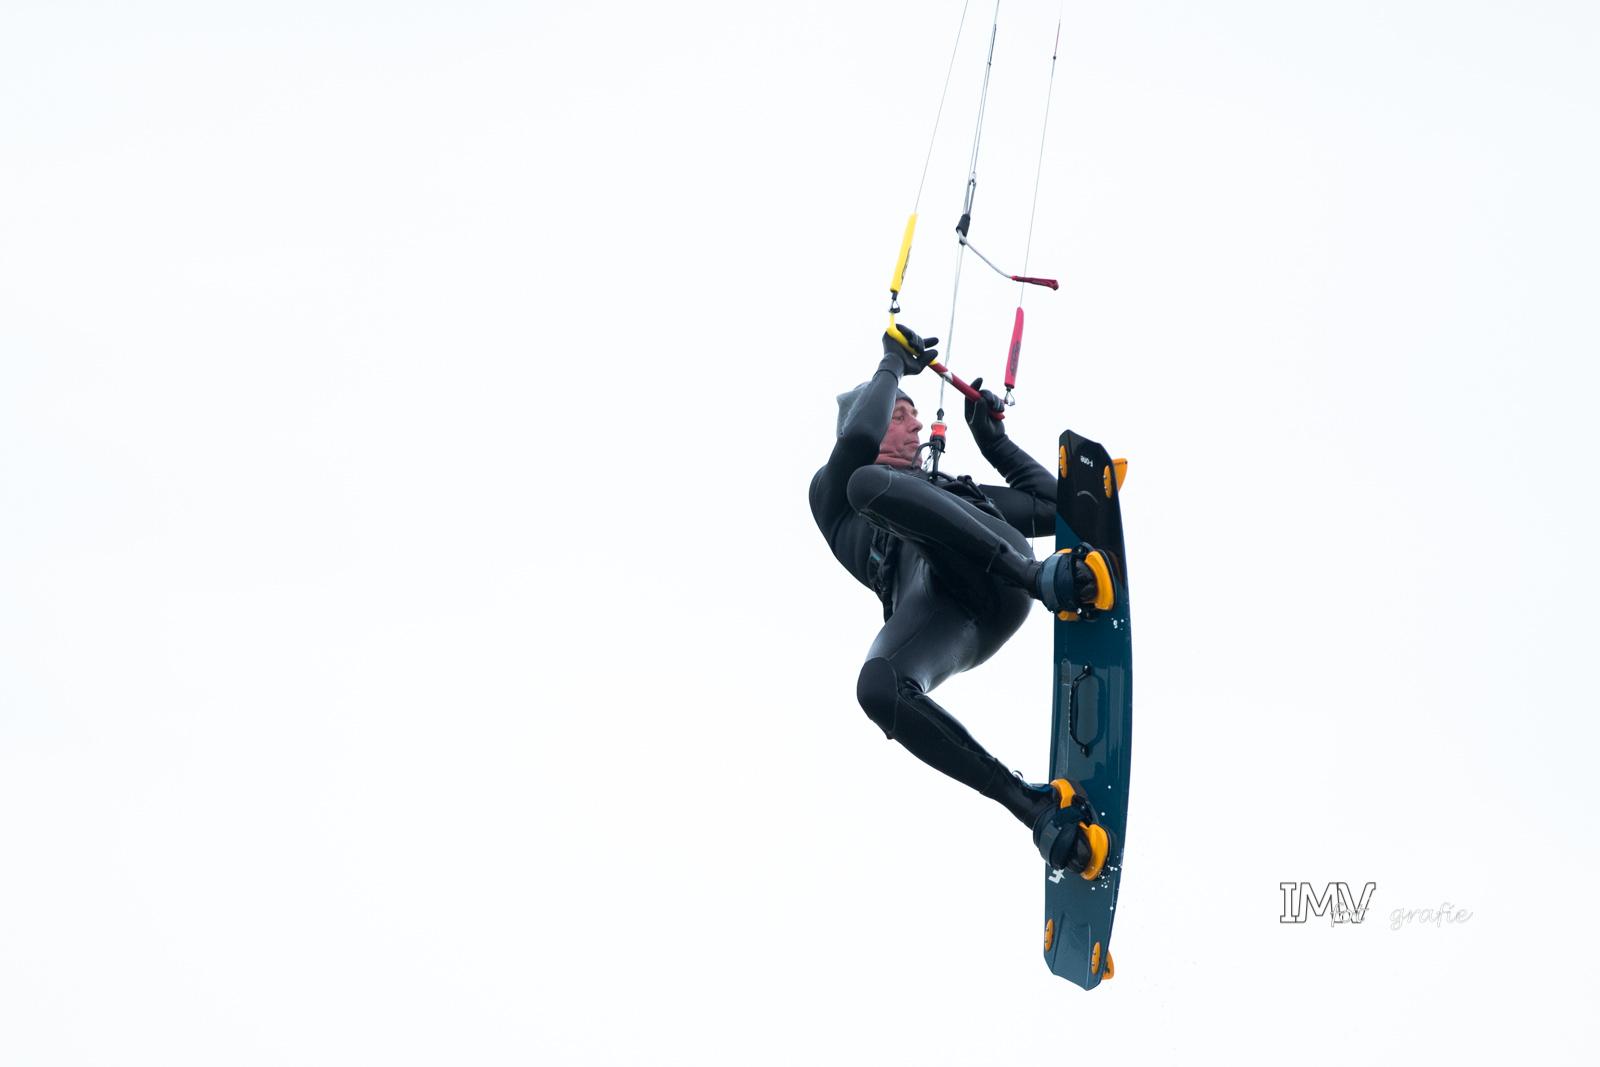 Kitesurfen zandmotor 22 februari 2020